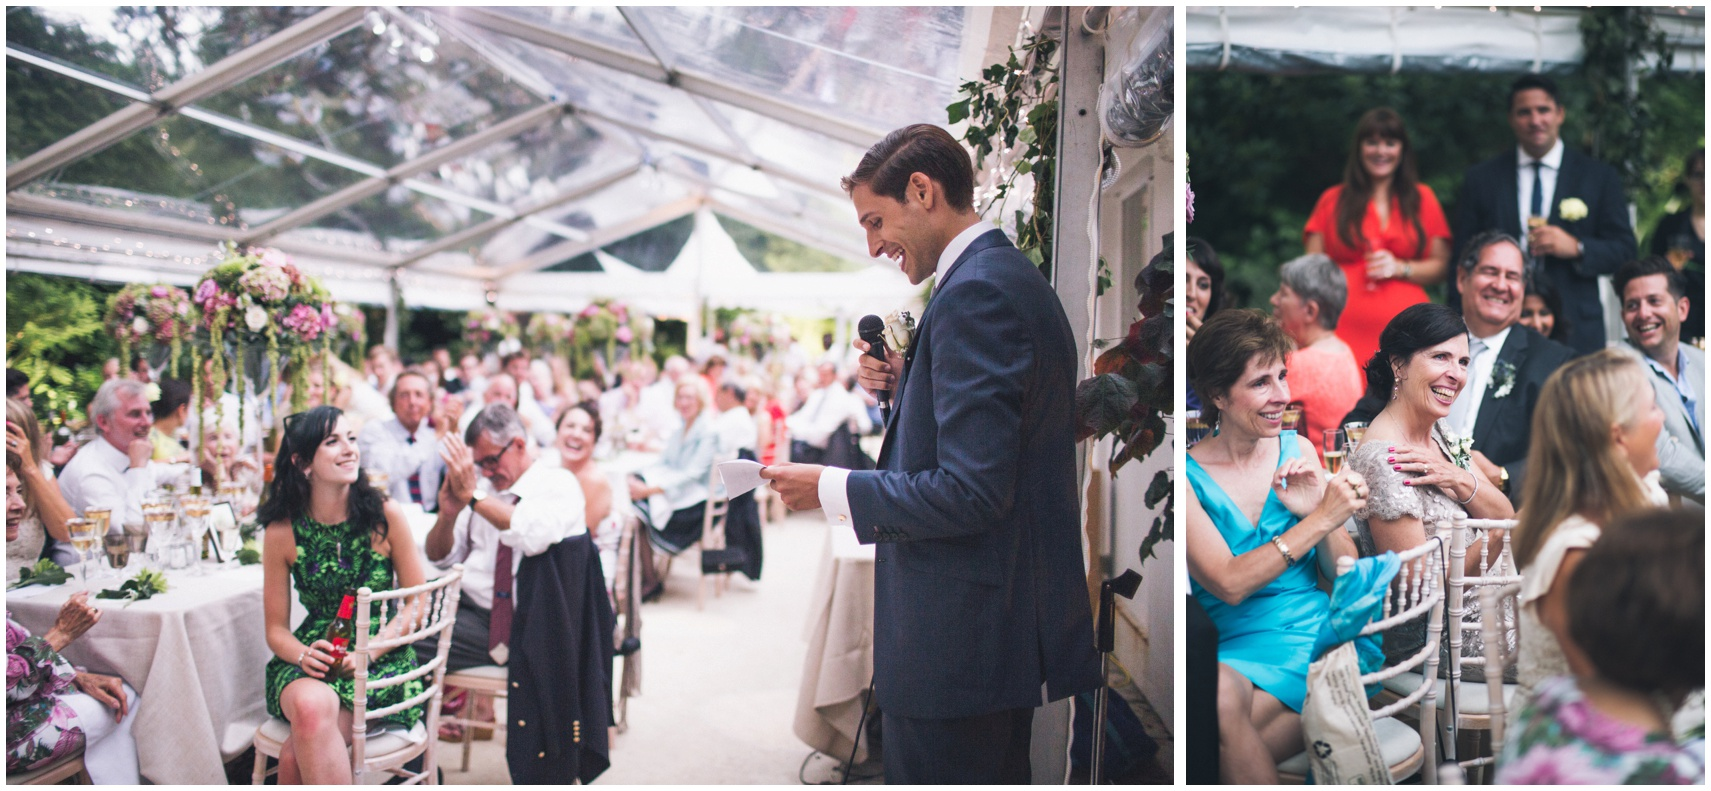 BMC Wedding photography Rutland_0343.jpg